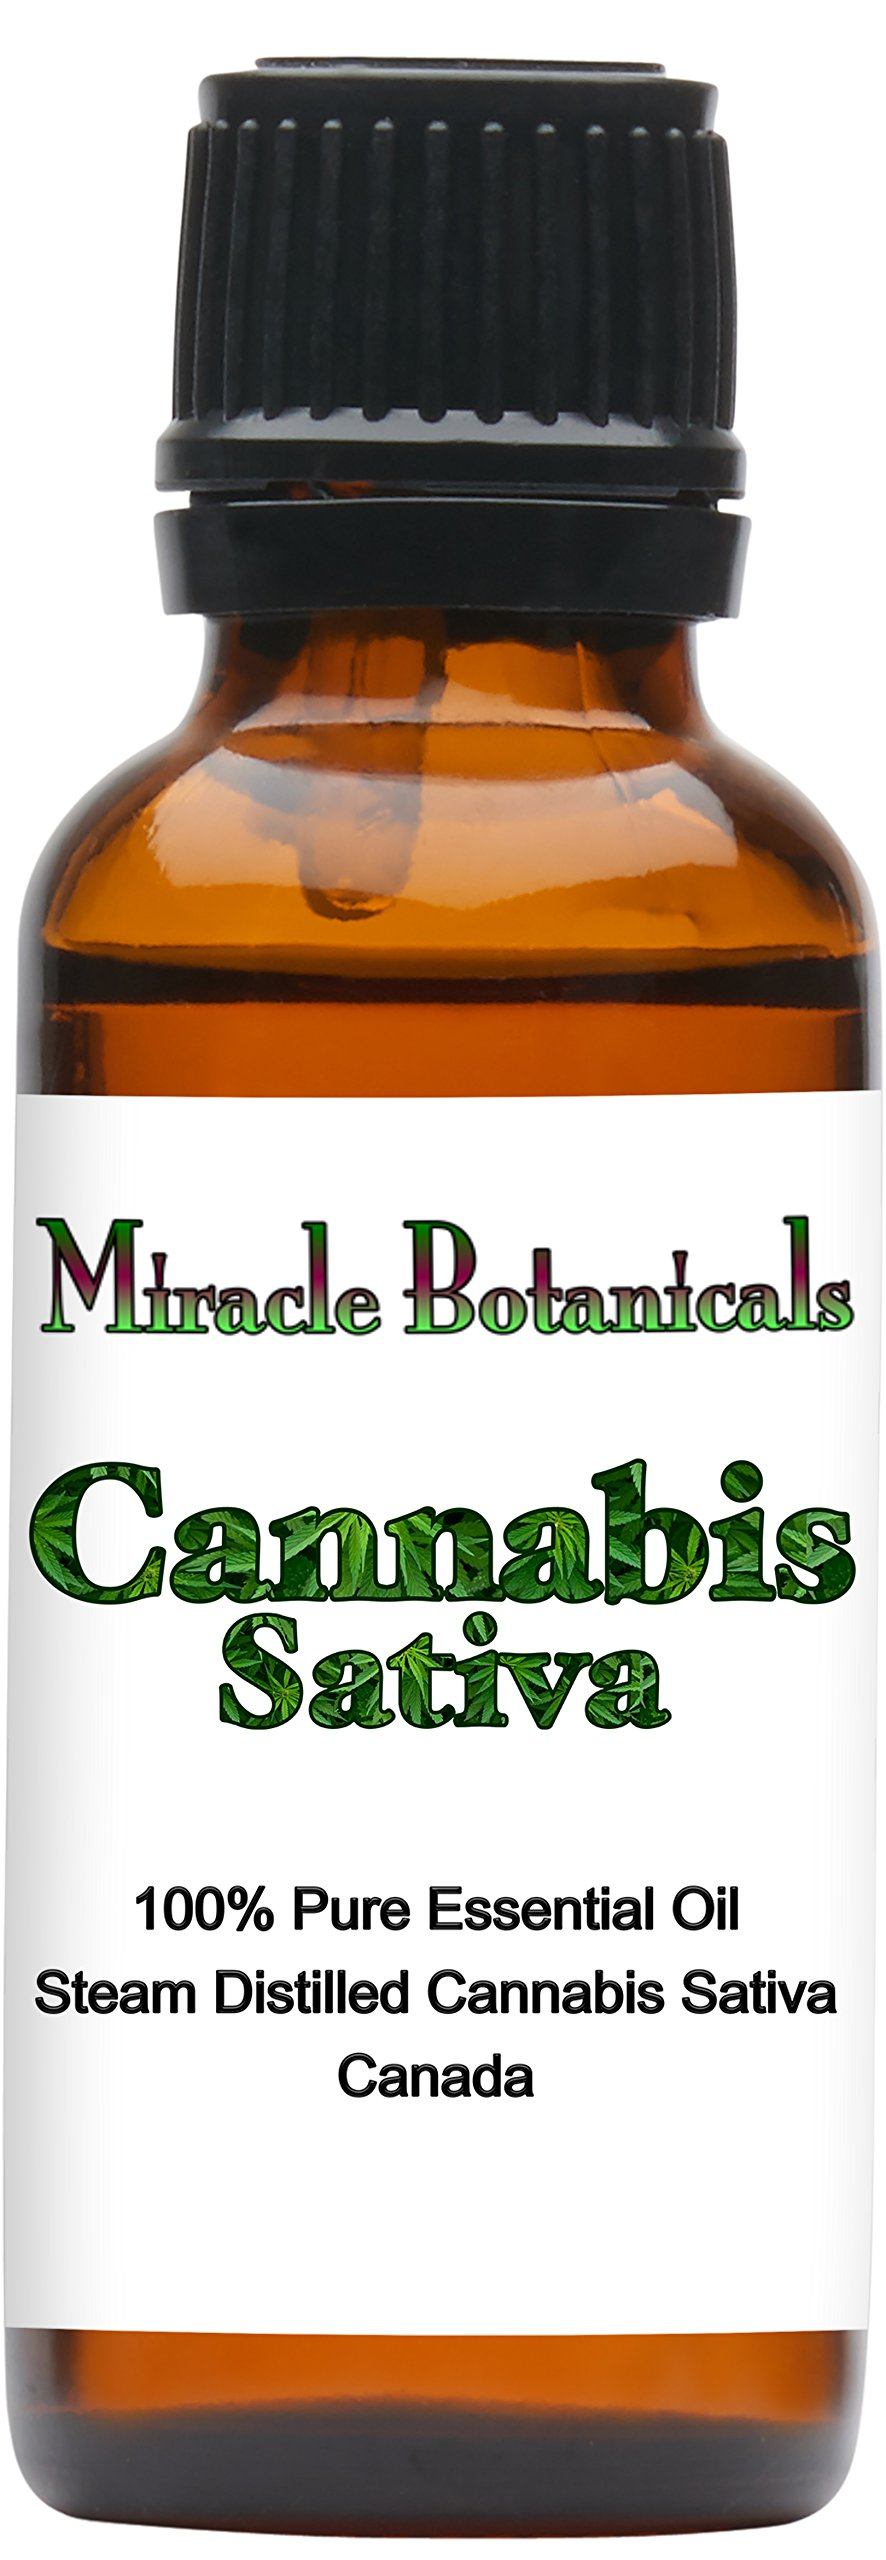 Miracle Botanicals Cannabis Sativa Essential Oil - 100% Pure Cannabis Sativa - Therapeutic Grade - 30ml/1oz.